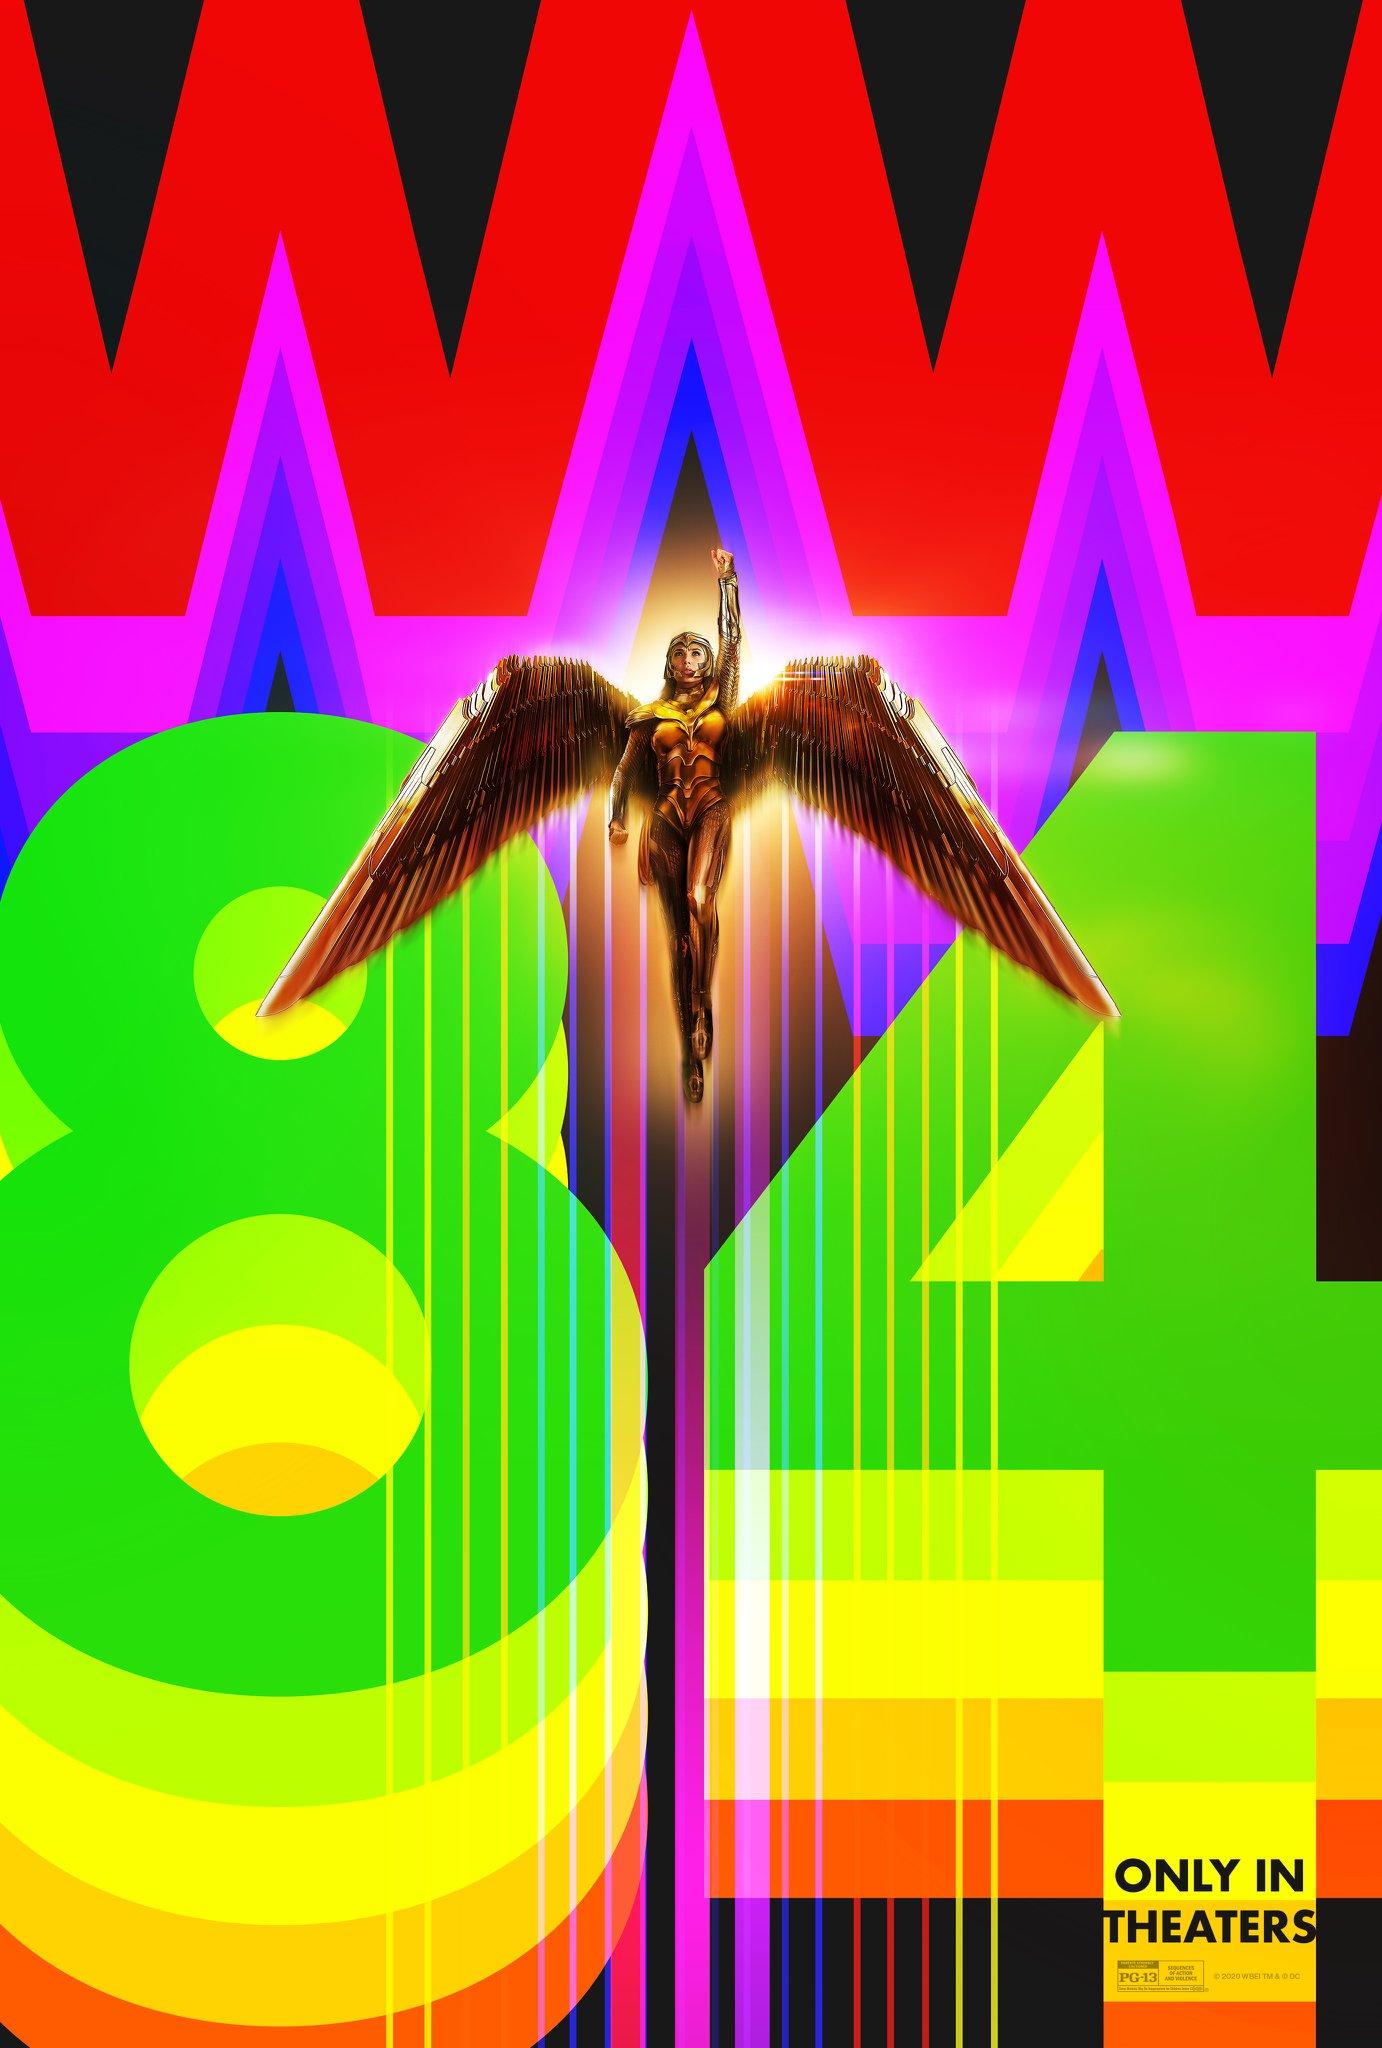 Wonder Woman 1984 / Trailer #2 Debuts at DC FanDome